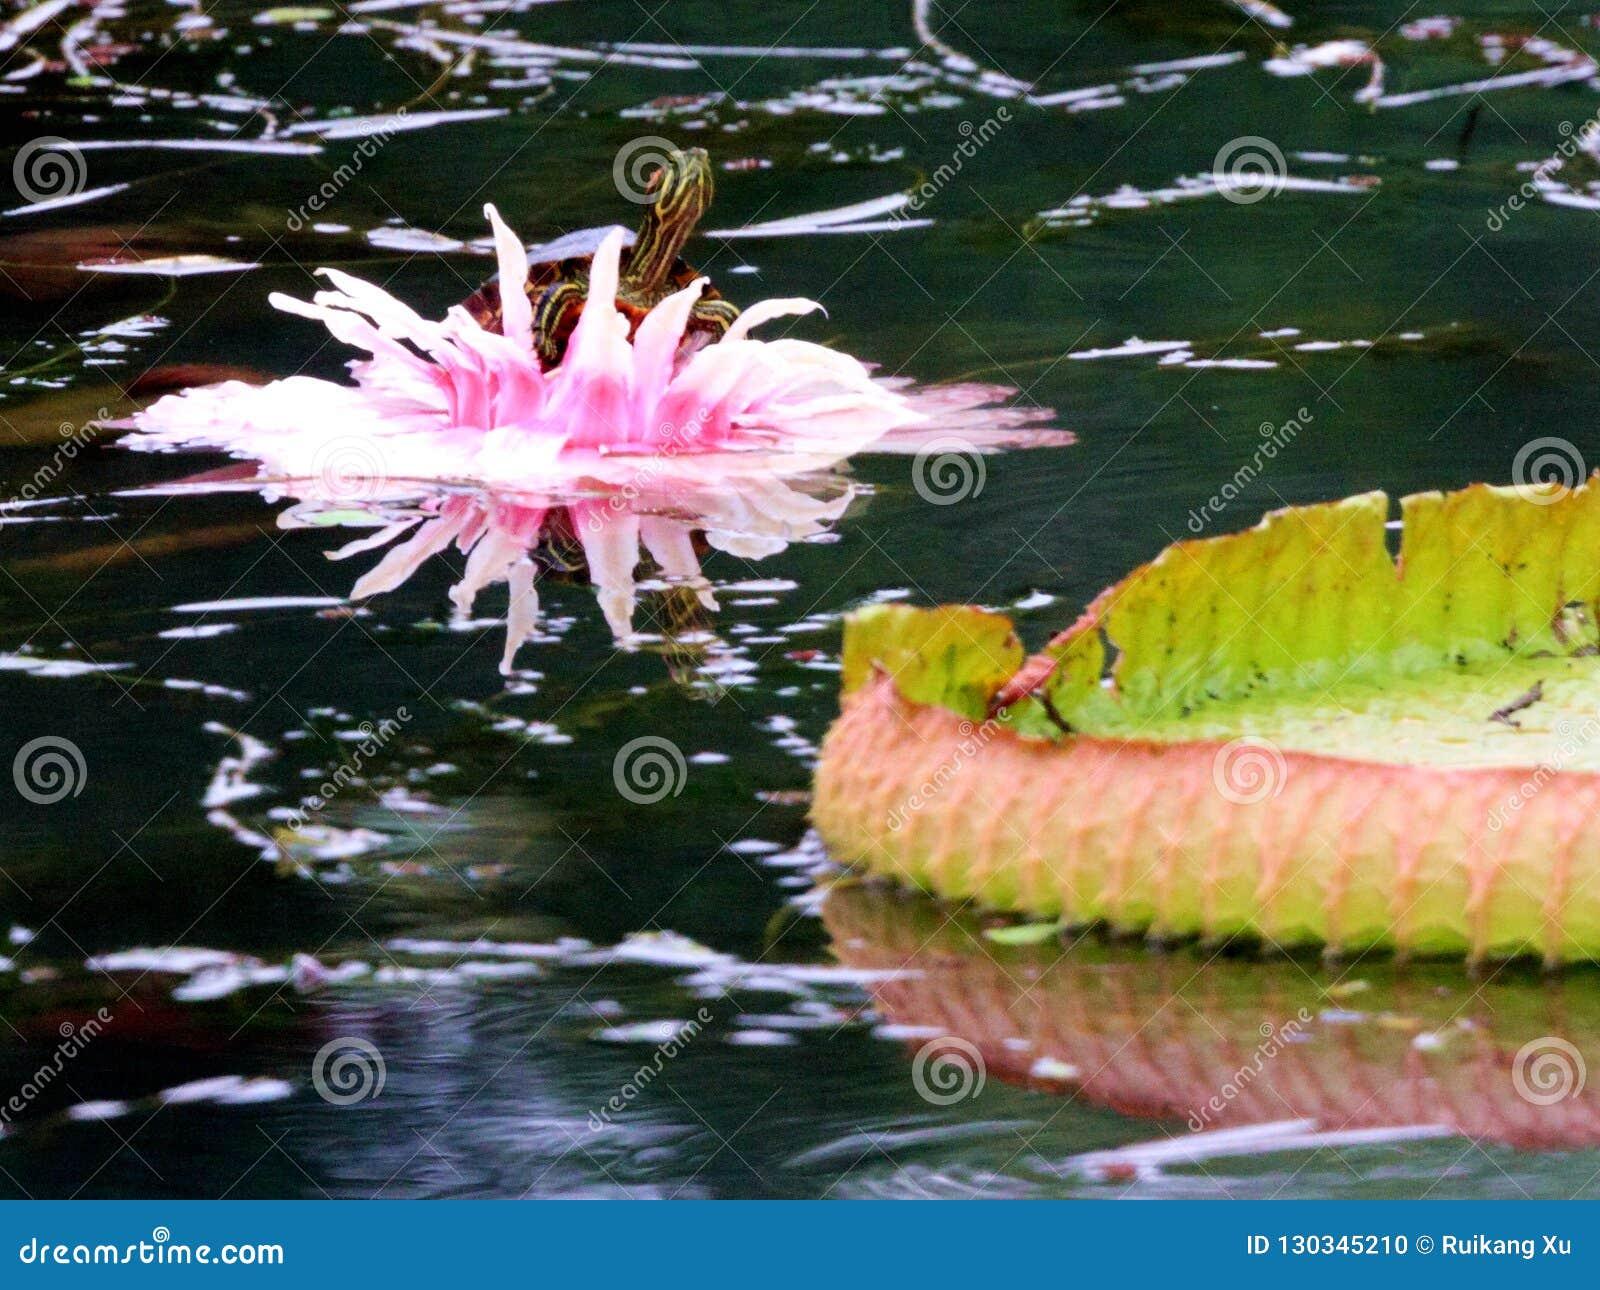 Galinha-d água Wang Lianchi da tartaruga de Lotus, agora rei